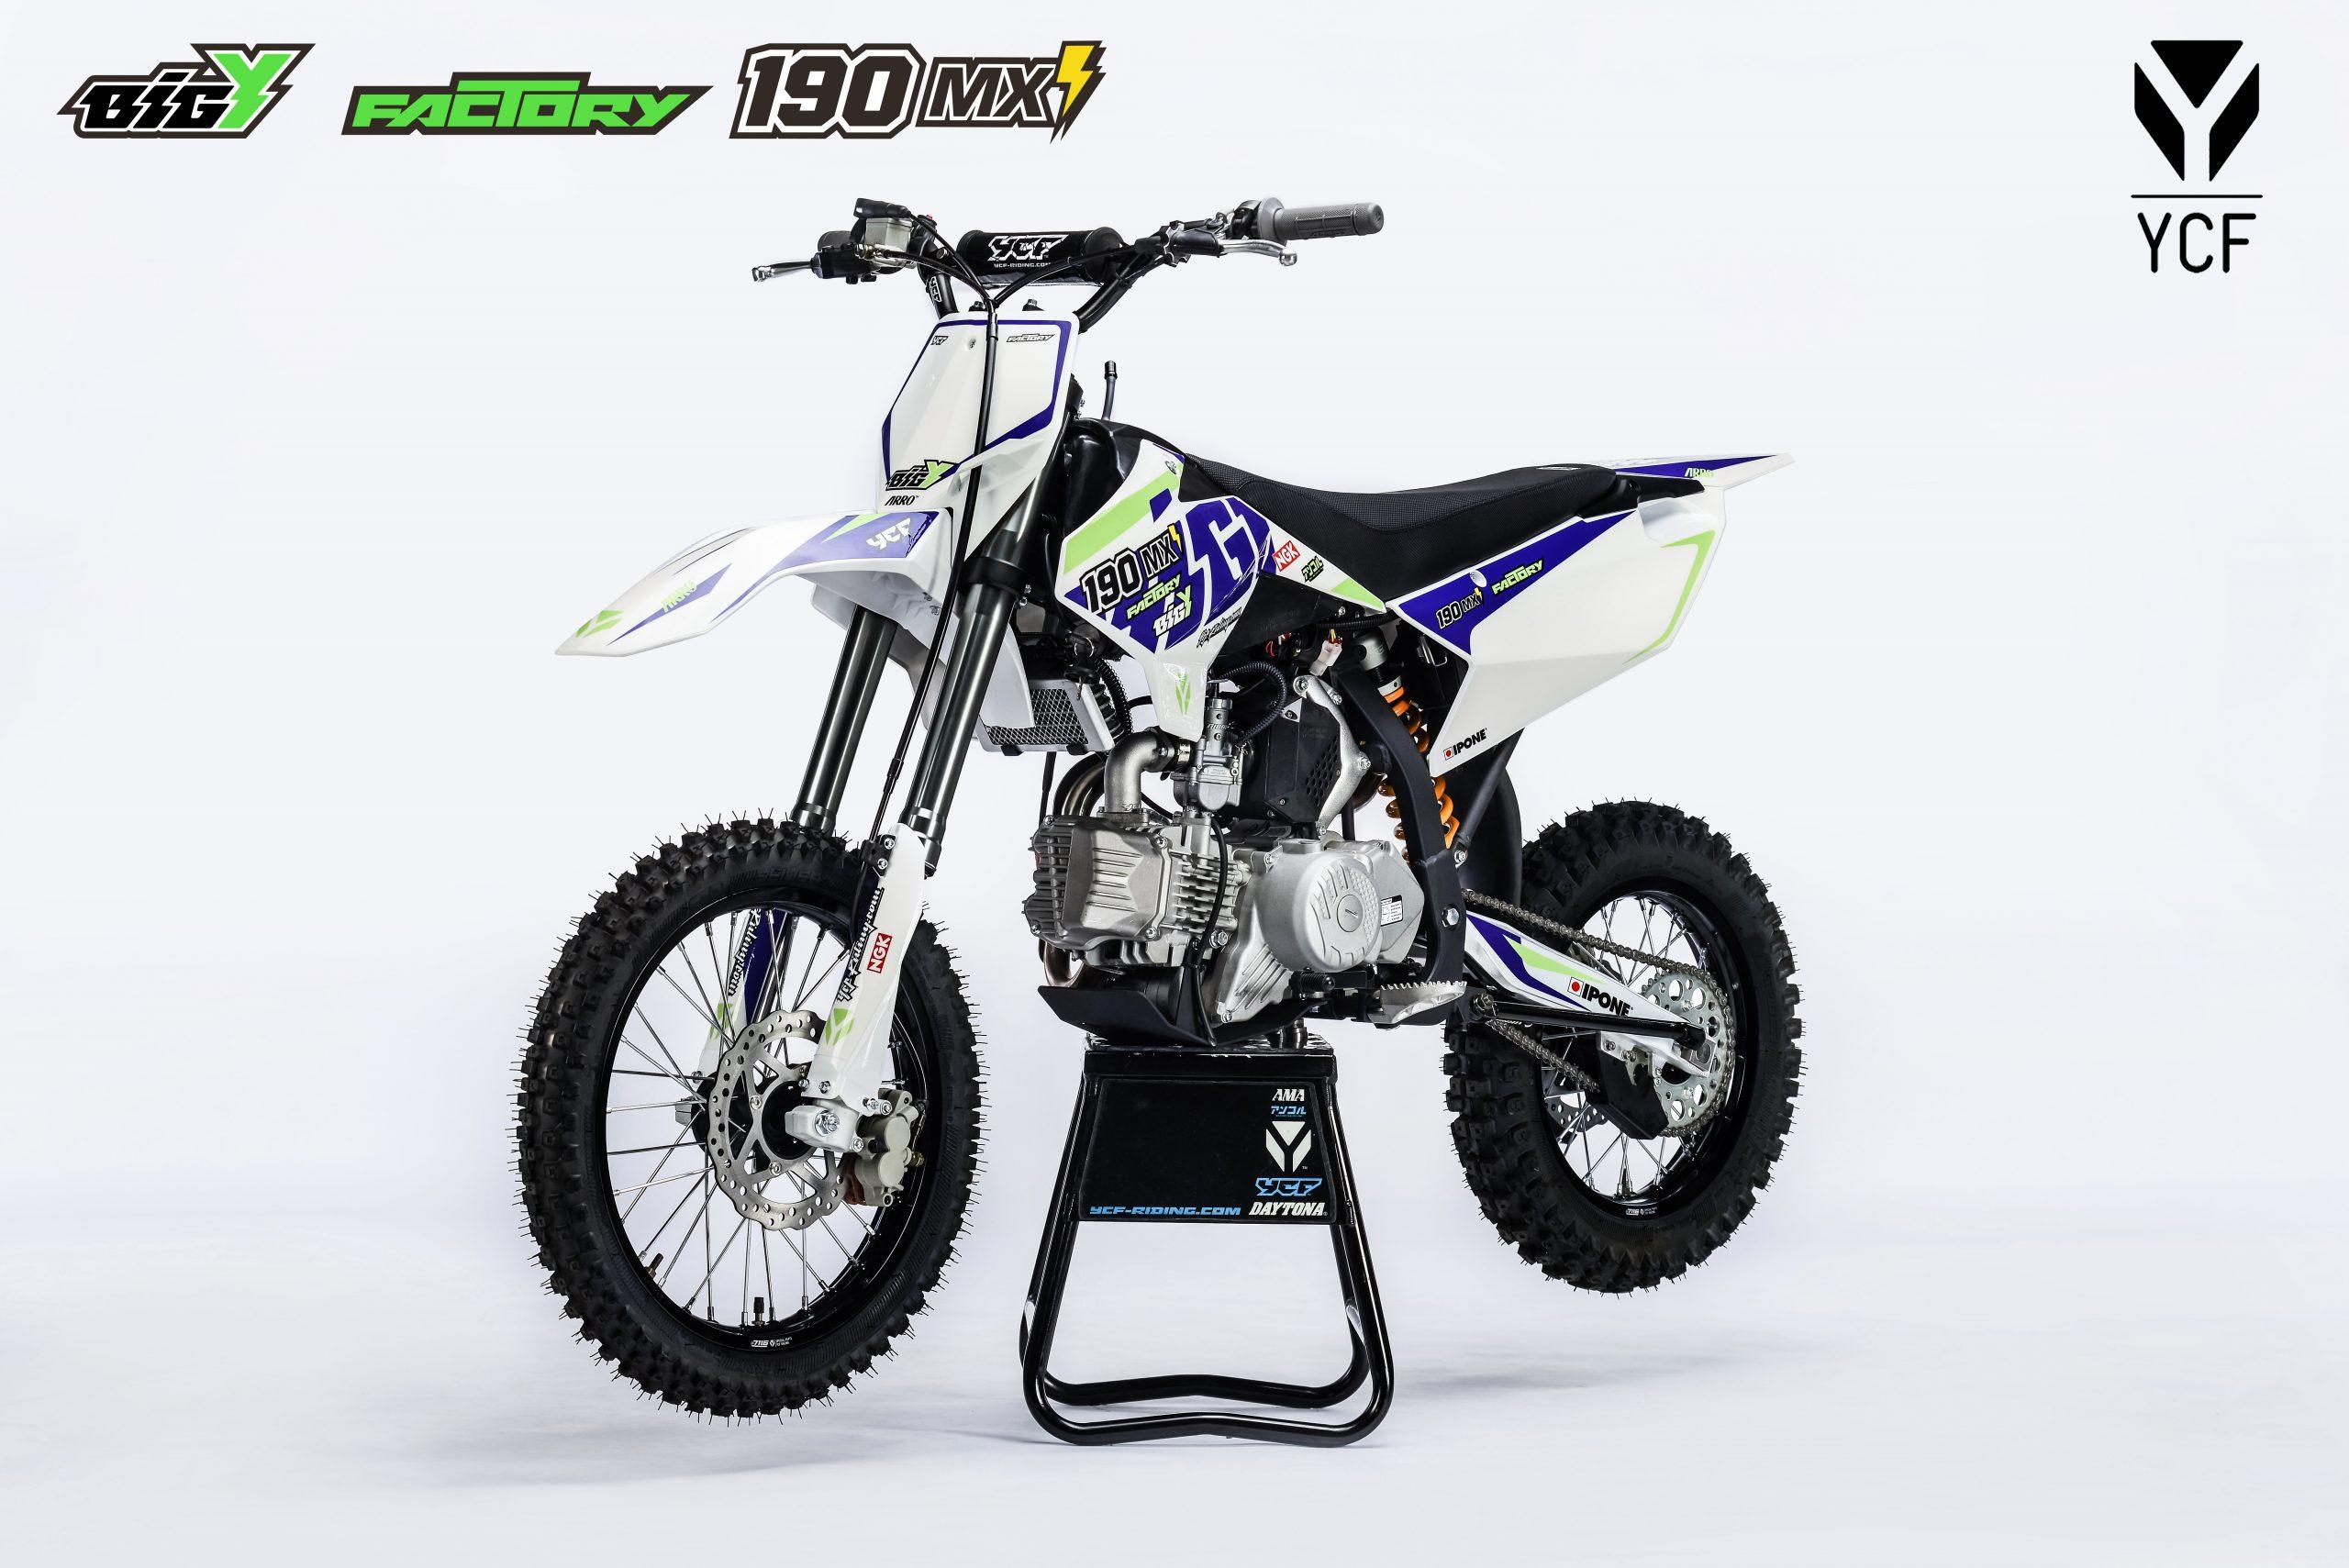 ПИТБАЙК YCF BIGY FACTORY 190 ZE MX 2021  Артмото - купить квадроцикл в украине и харькове, мотоцикл, снегоход, скутер, мопед, электромобиль